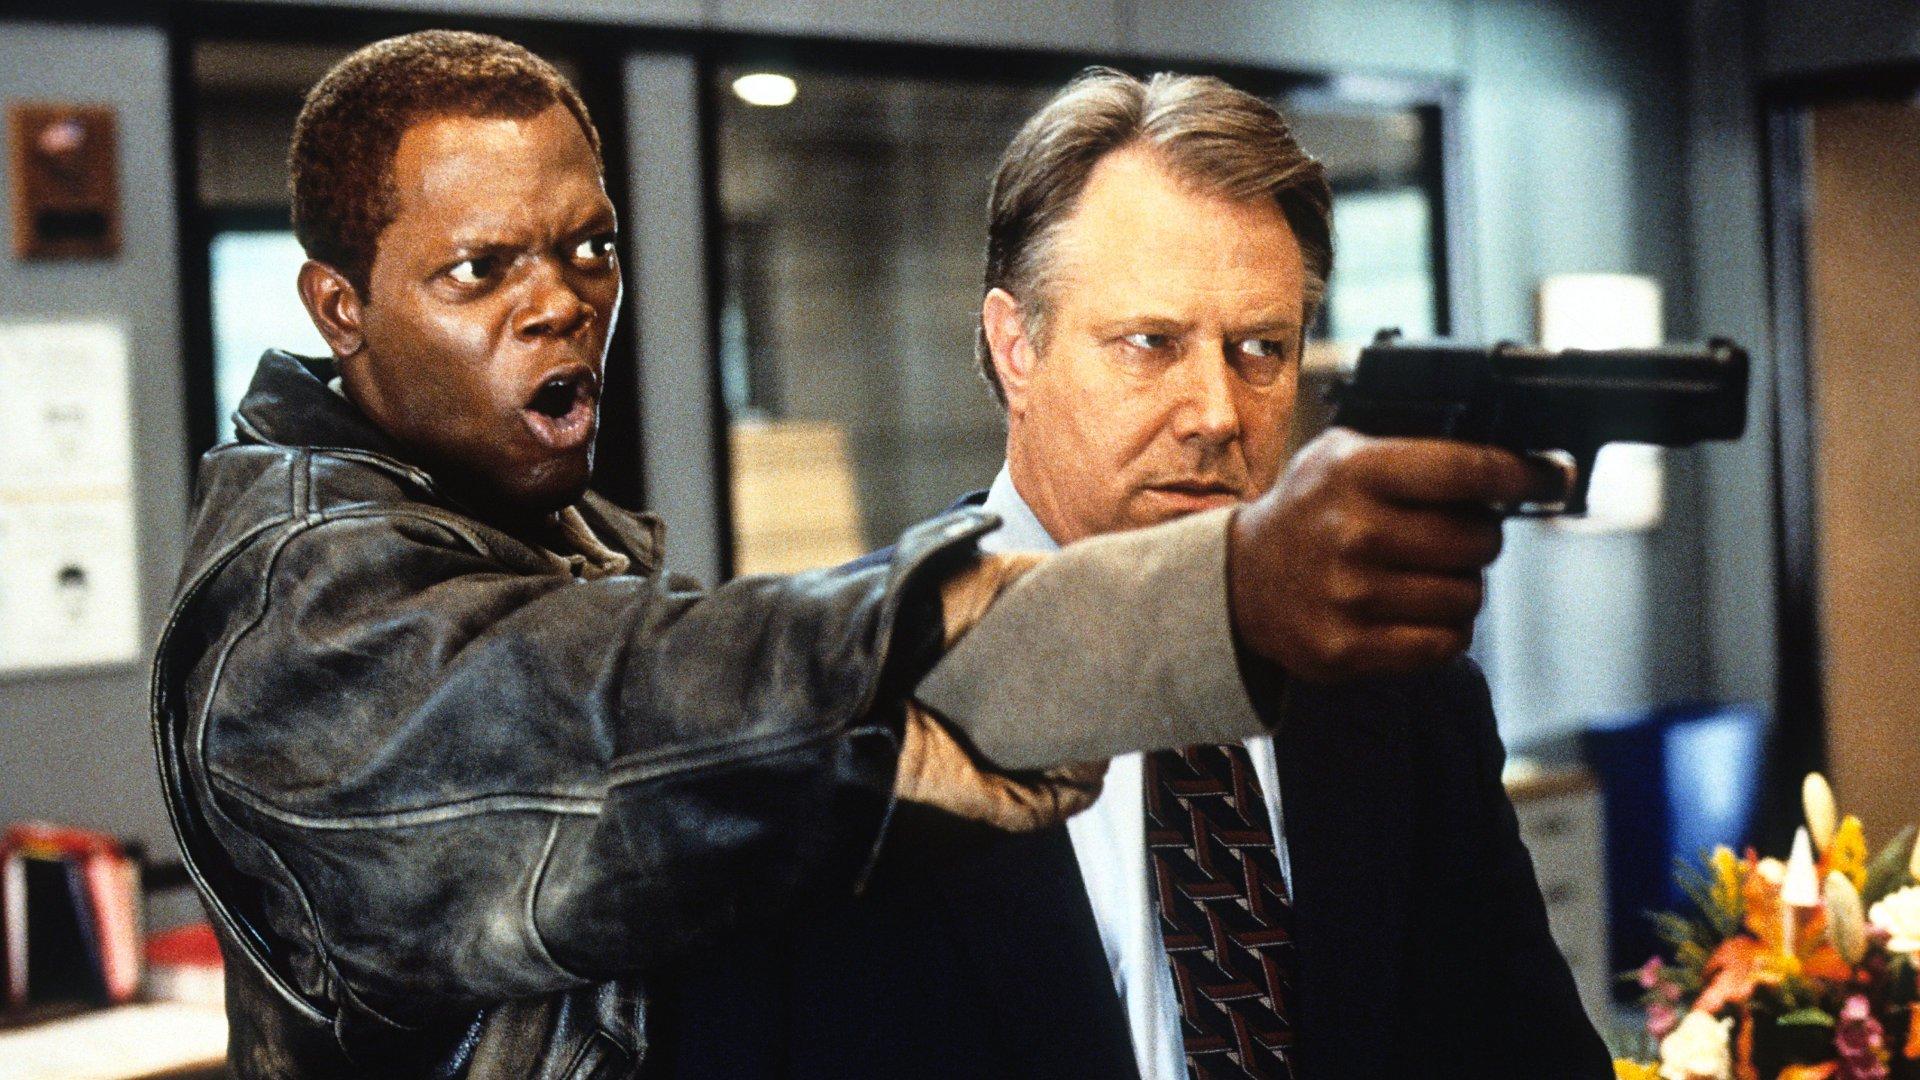 Samuel Jackson in The Negotiator